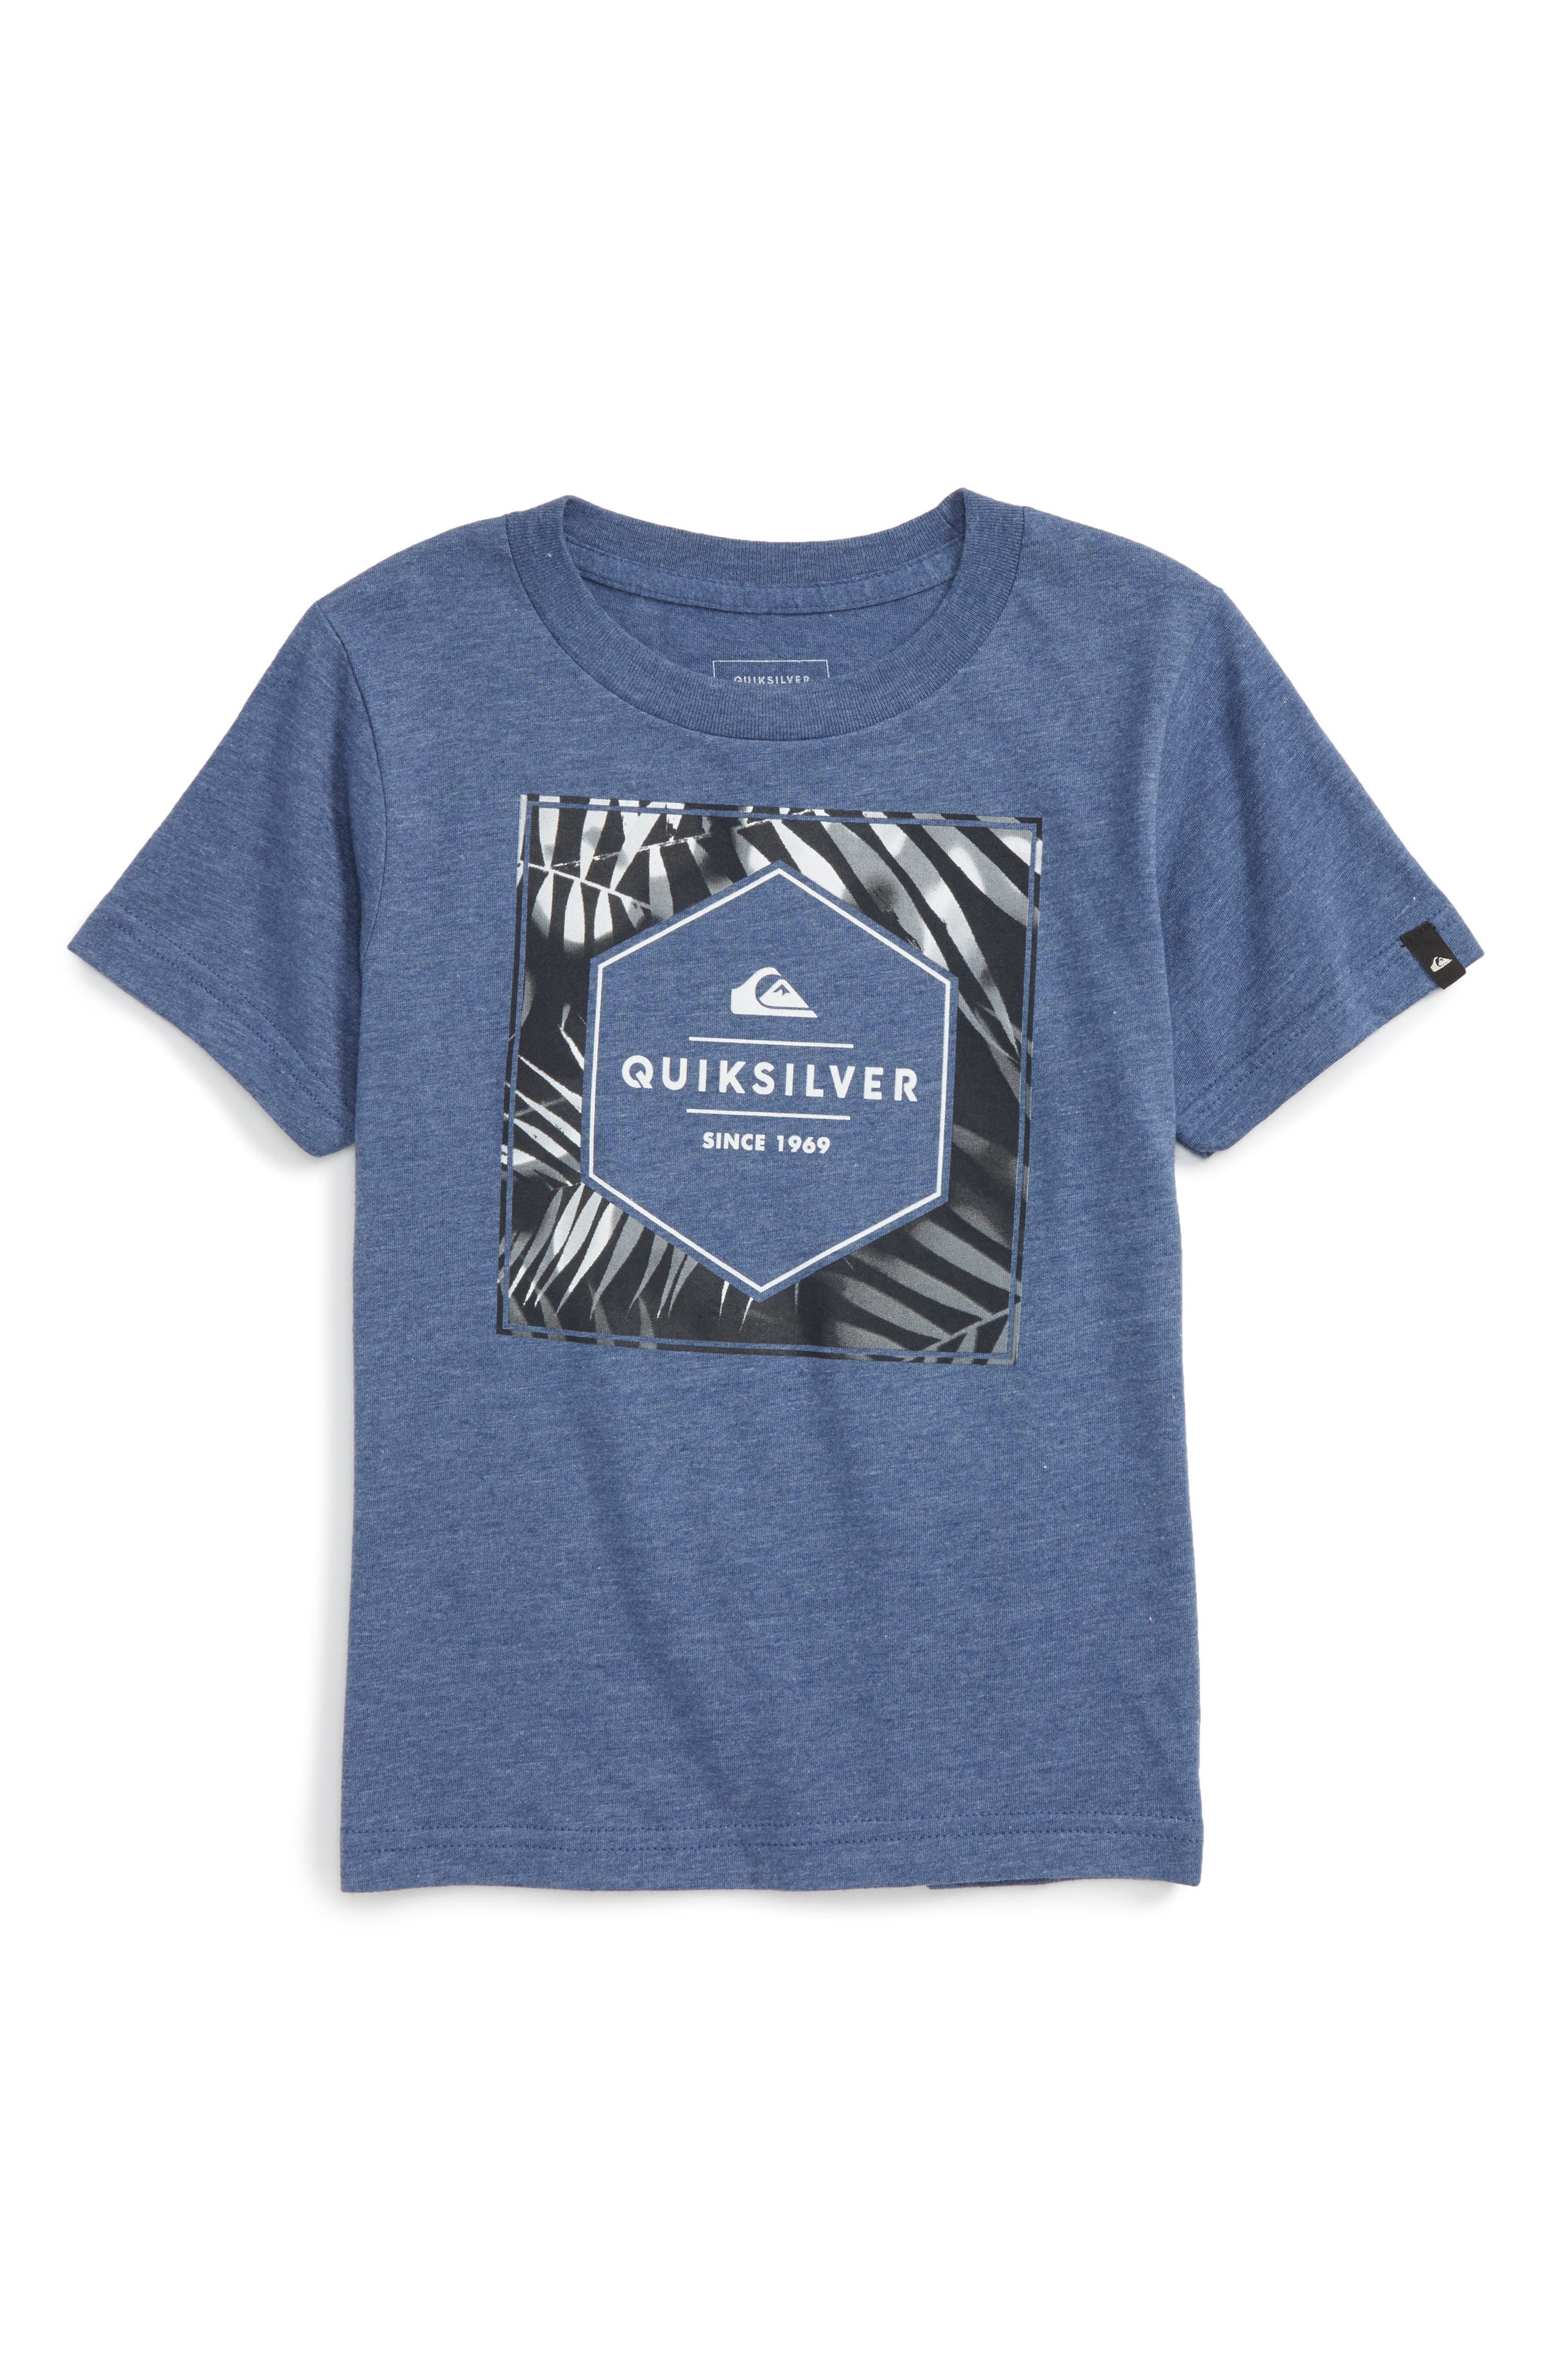 Quiksilver Hex Graphic T-Shirt (Toddler Boys & Little Boys)